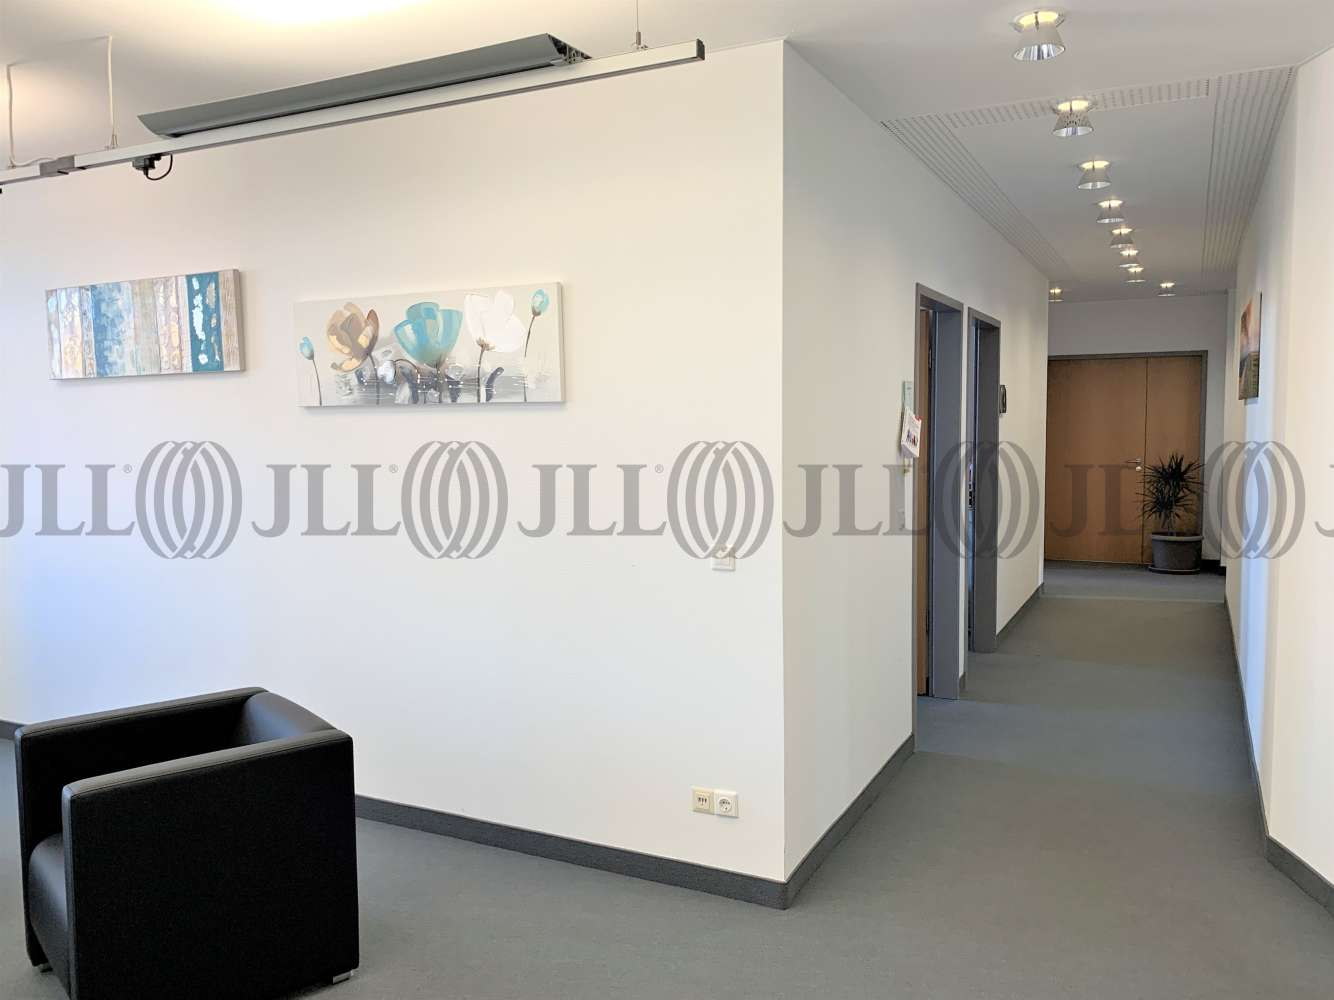 Büros Leipzig, 04177 - Büro - Leipzig, Altlindenau - B1516 - 10901495